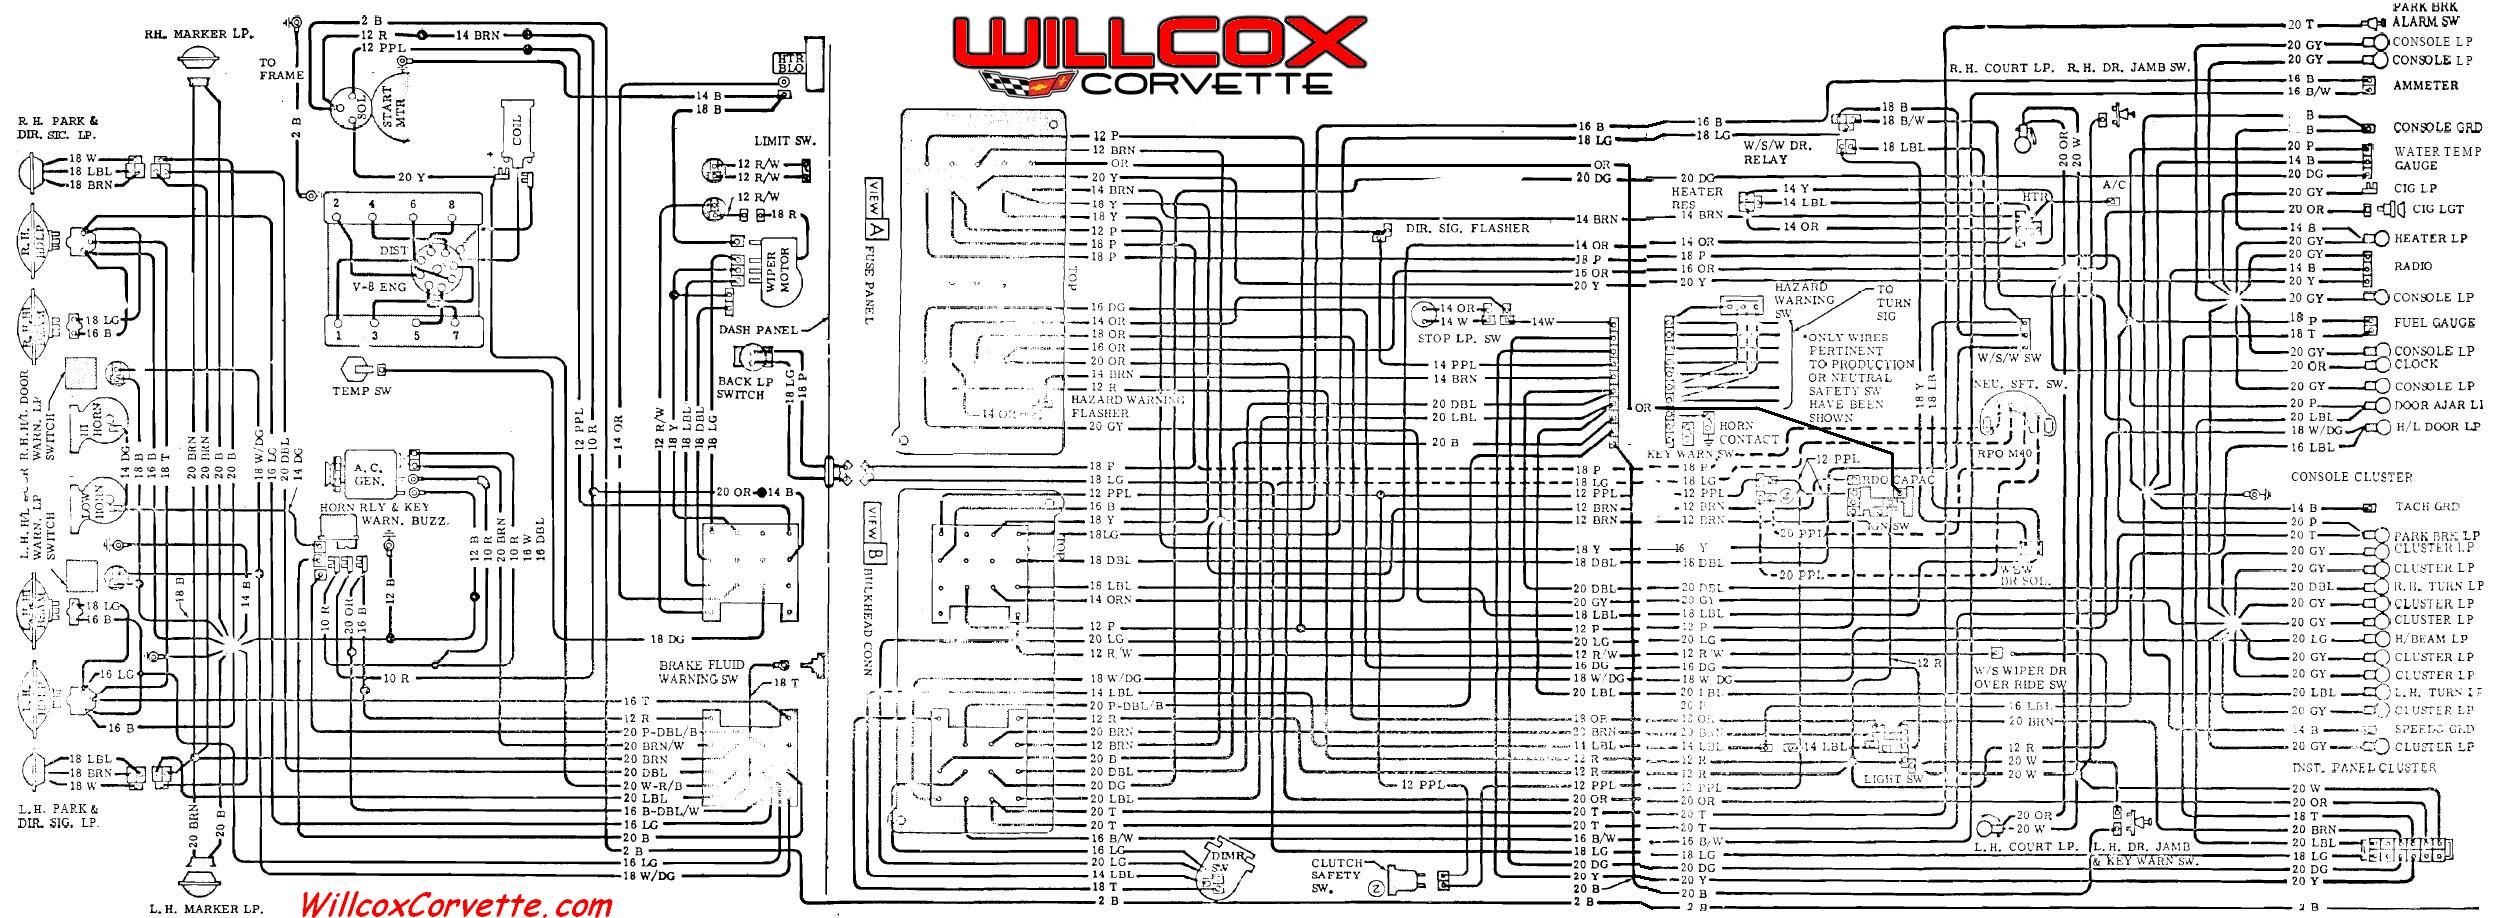 Pleasant Corvette Engine Schematics Basic Electronics Wiring Diagram Wiring Cloud Xempagosophoxytasticioscodnessplanboapumohammedshrineorg